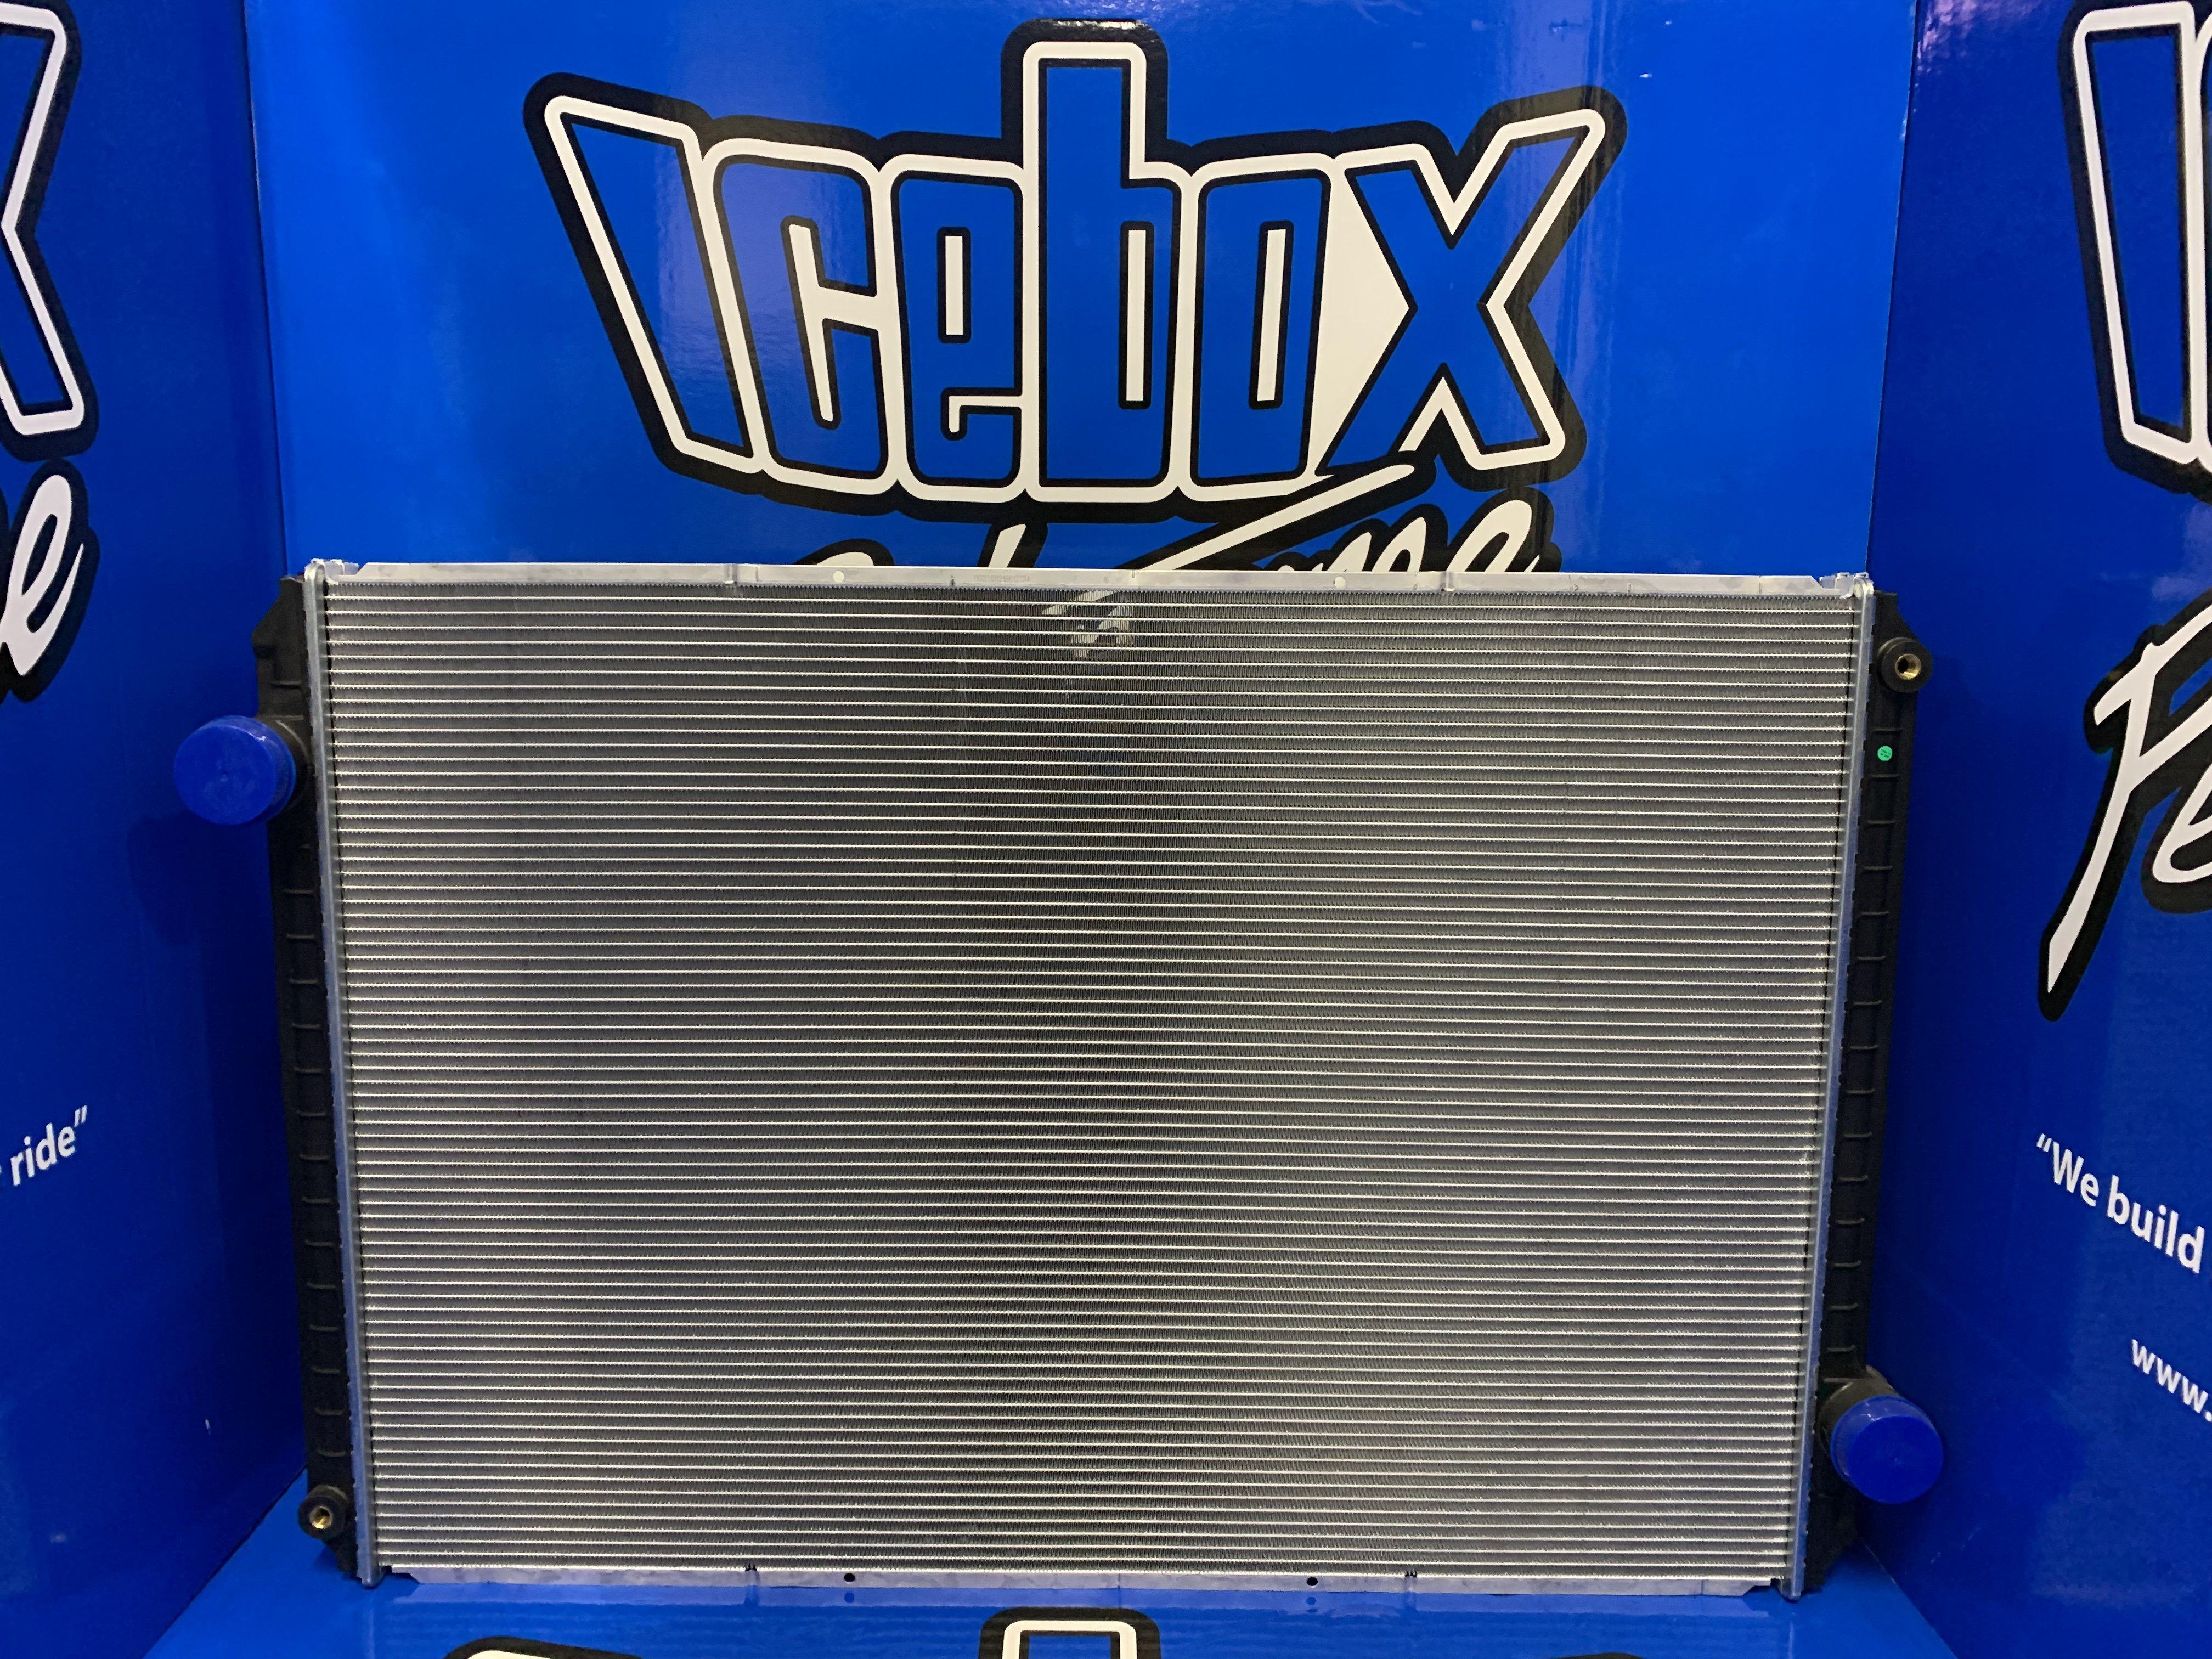 radiator-international-new-part-no-1698743c92-144333-15101415